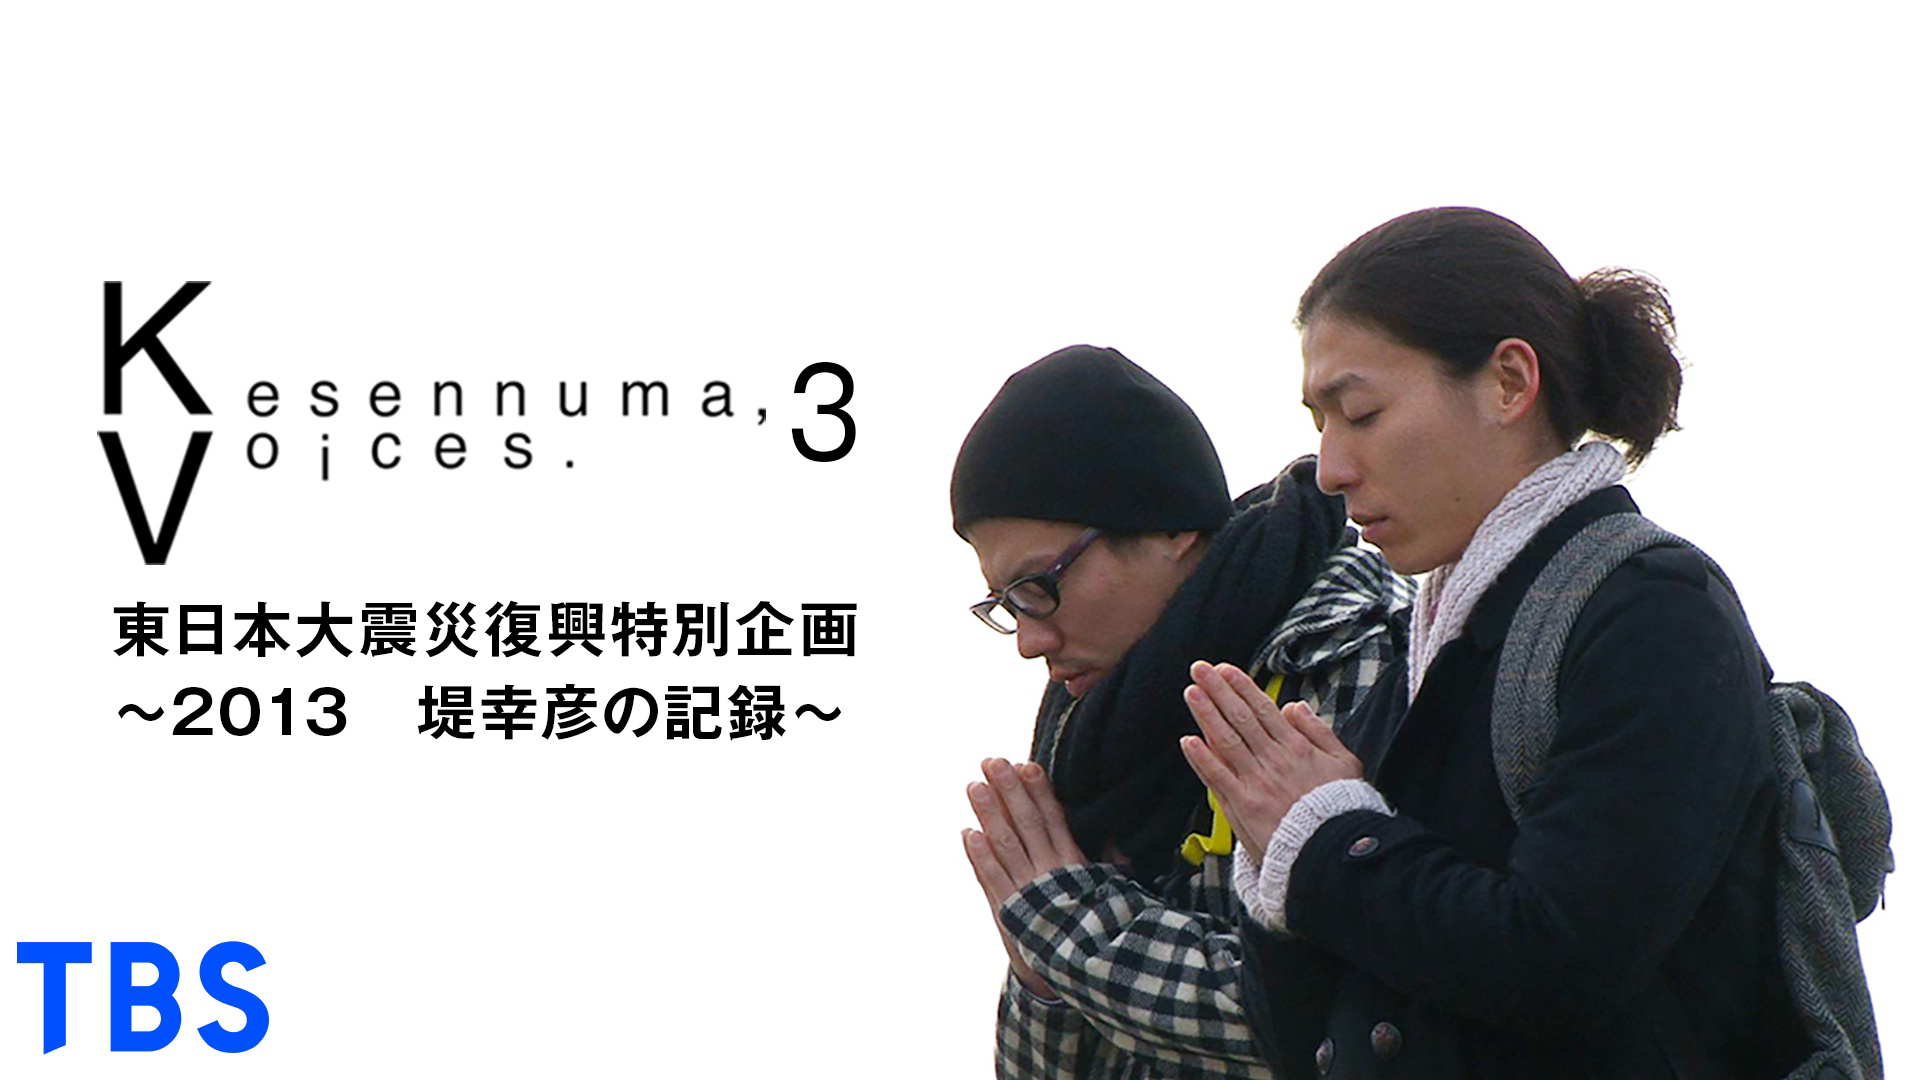 Kesennuma,Voices.3 東日本大震災復興特別企画~2013 堤幸彦の記録~の動画 - Kesennuma,Voices.7 東日本大震災復興特別企画~2017 堤幸彦の記録~